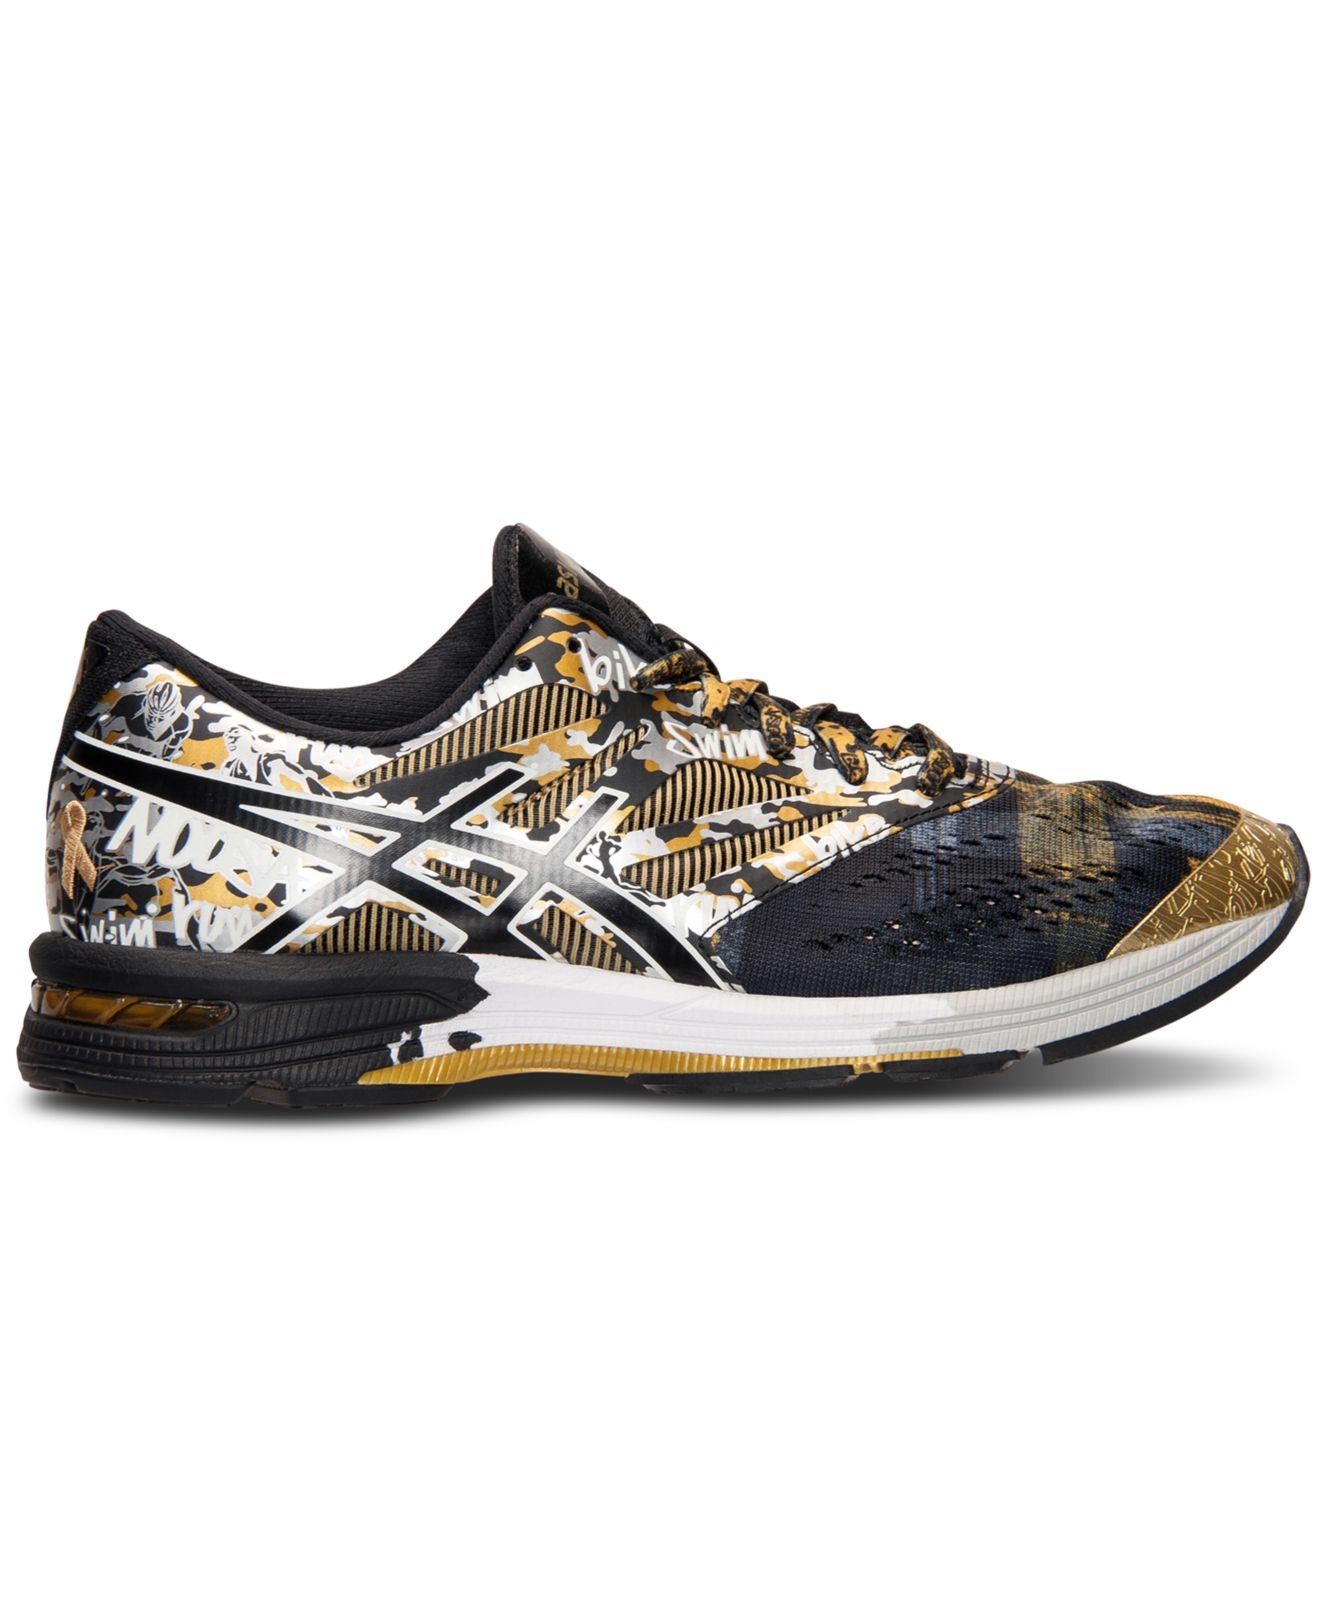 watch 83609 5efda Asics Men s Gel-noosa Tri 10 Gr Running Sneakers From Finish Line in ...